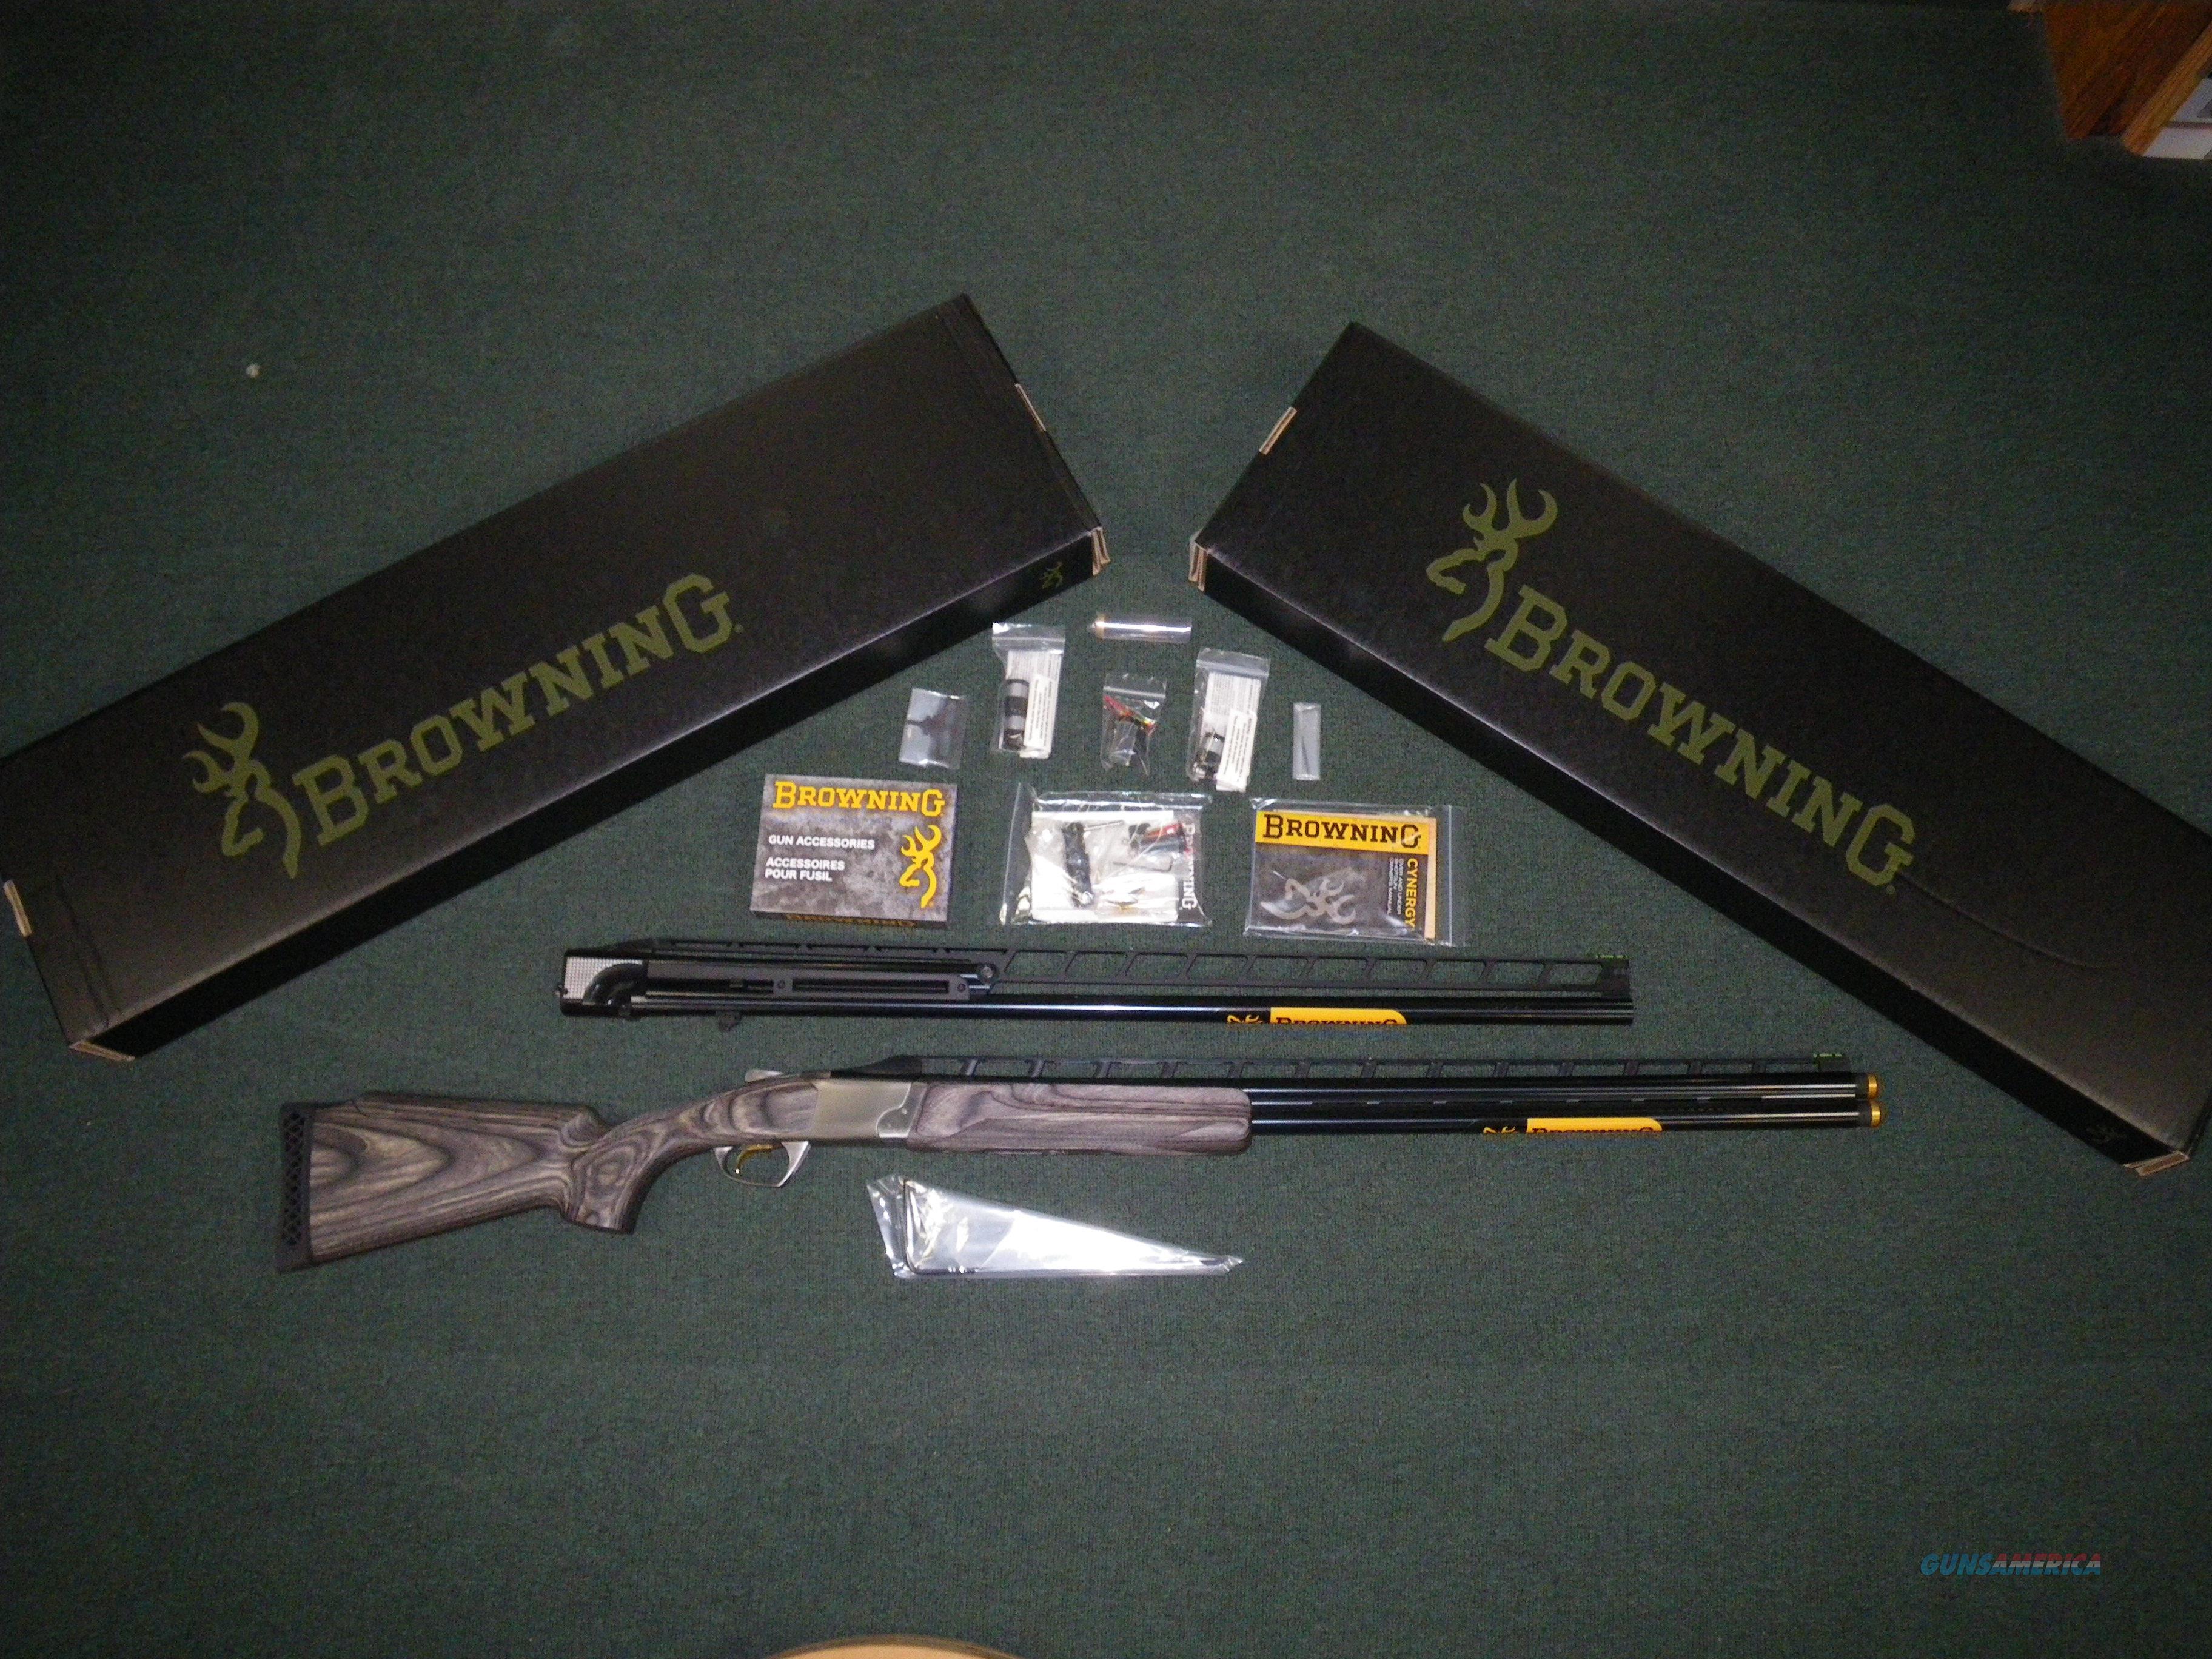 "Browning Cynergy Trap Unsingle Combo 12ga 32""/34"" #018707479  Guns > Shotguns > Browning Shotguns > Over Unders > Cynergy > Hunting"